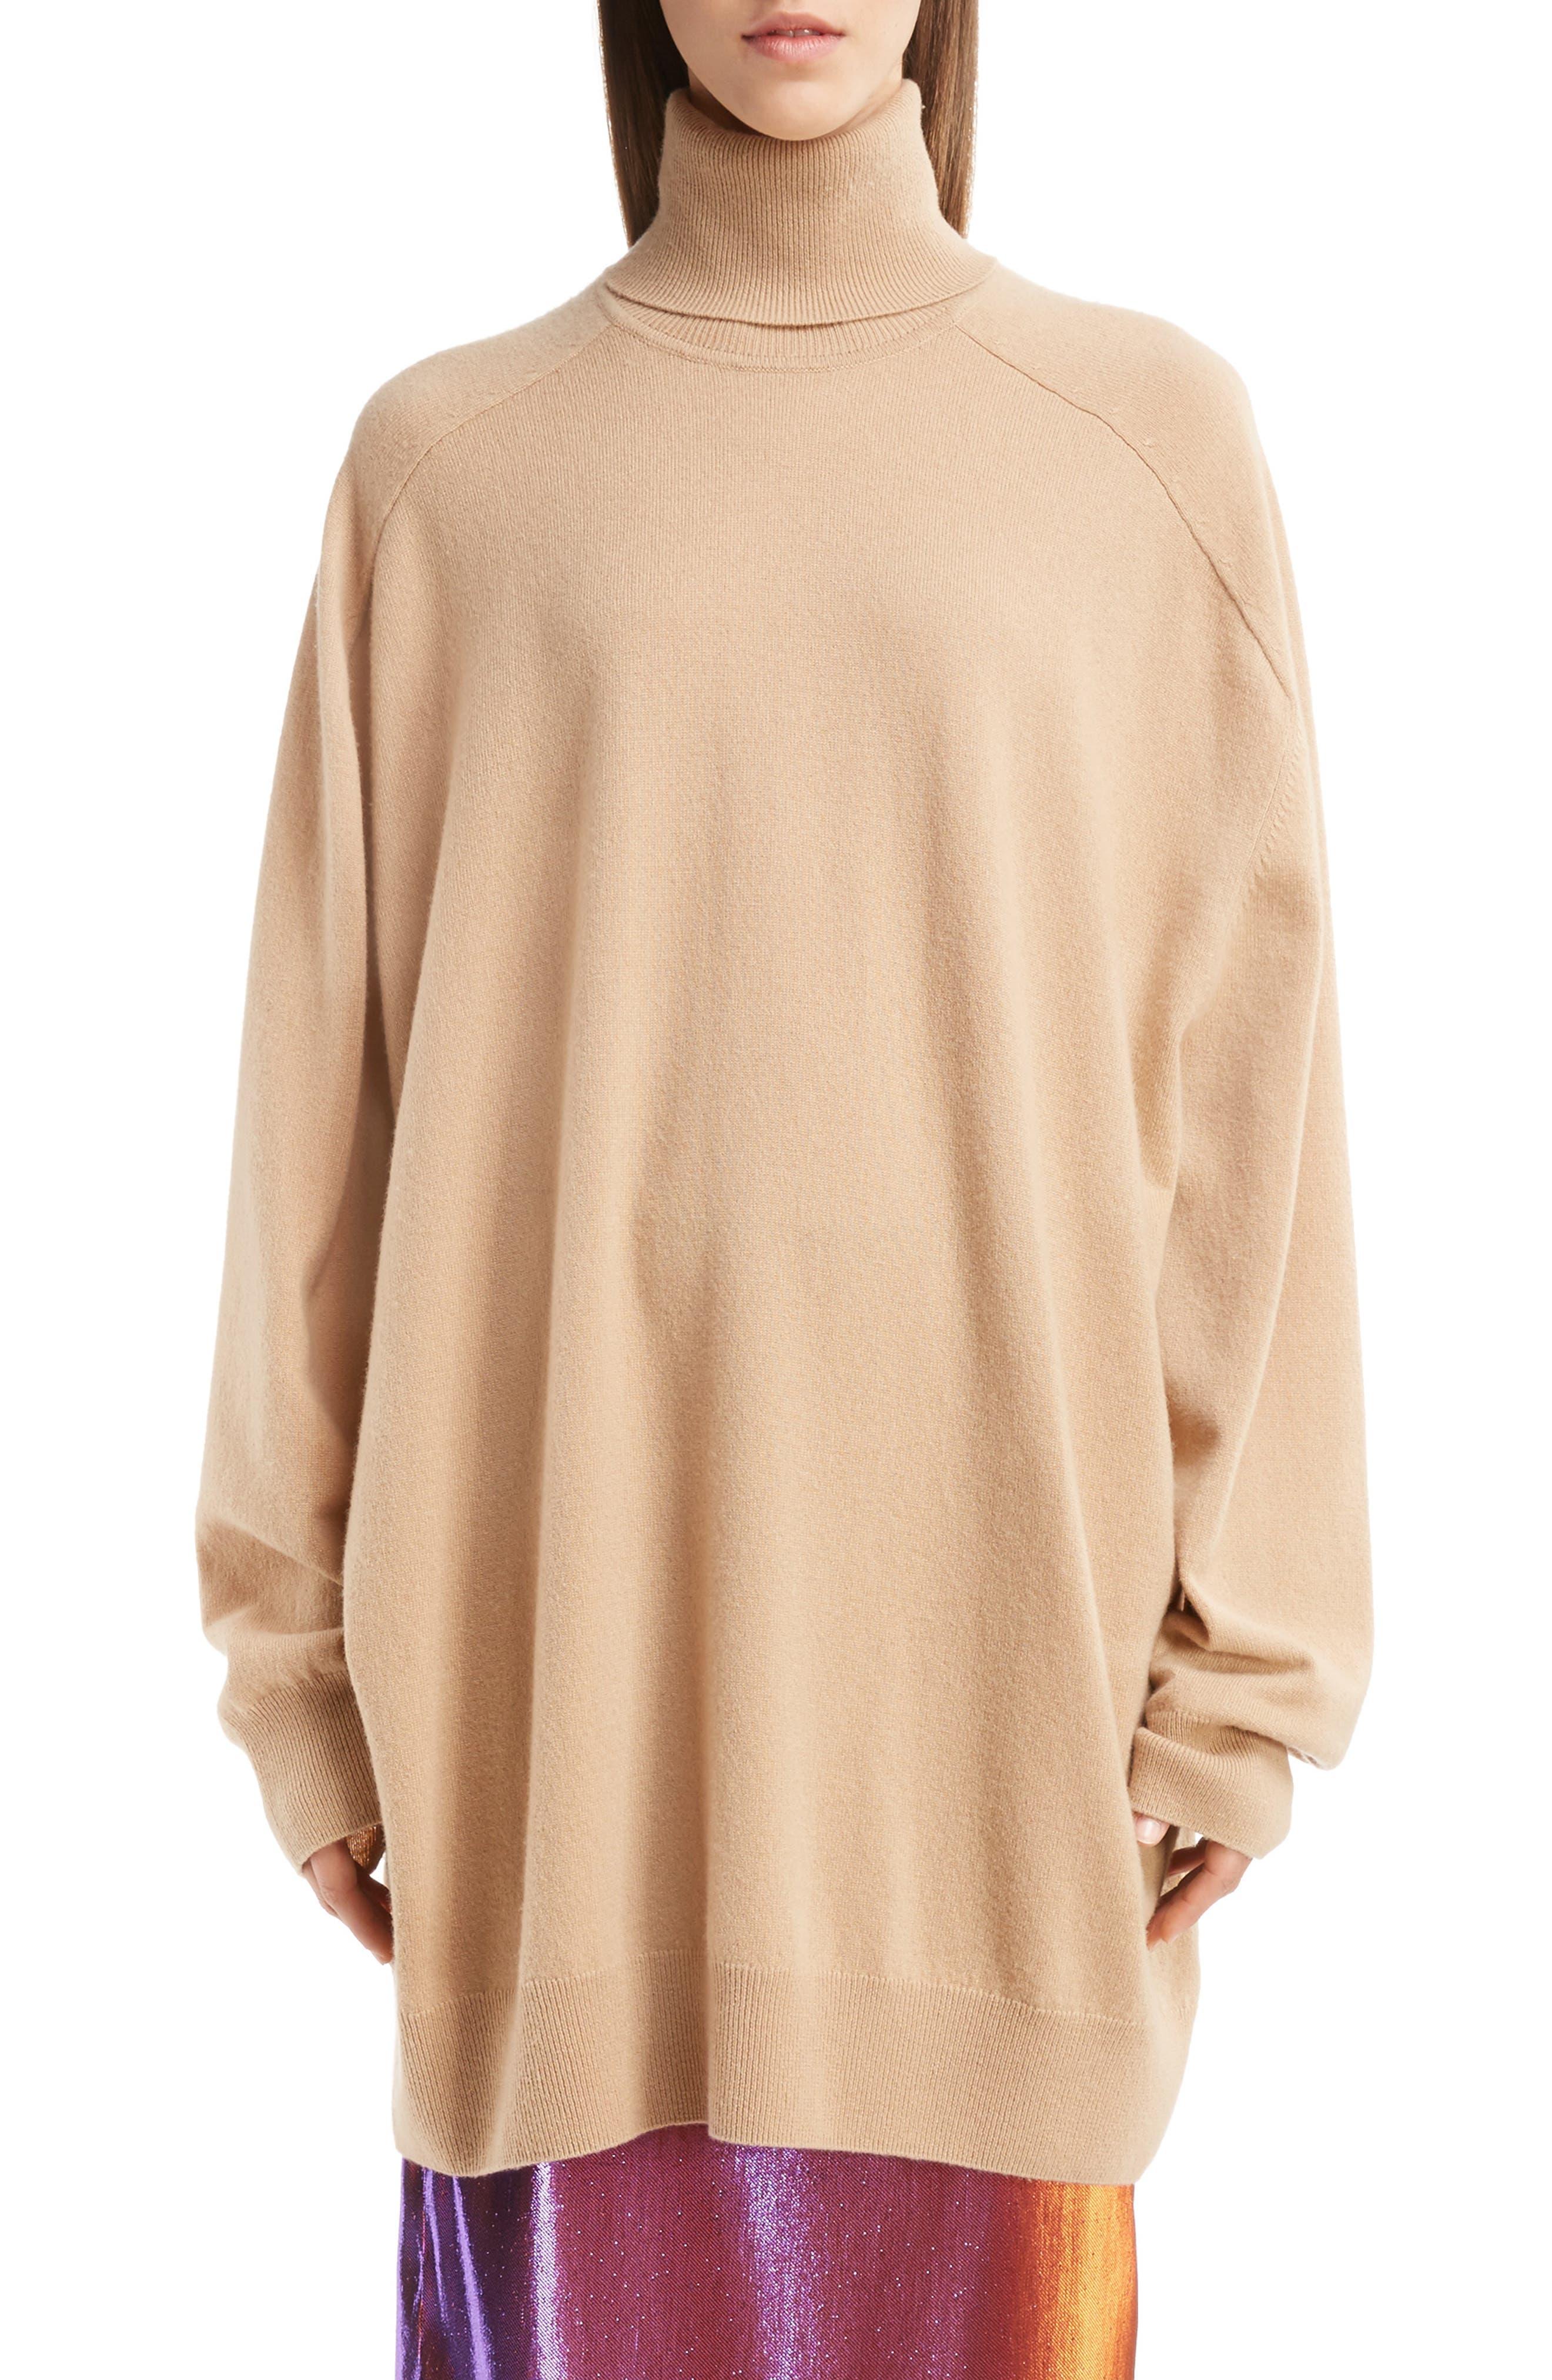 Oversized Cashmere Turtleneck Sweater,                             Main thumbnail 1, color,                             Camel